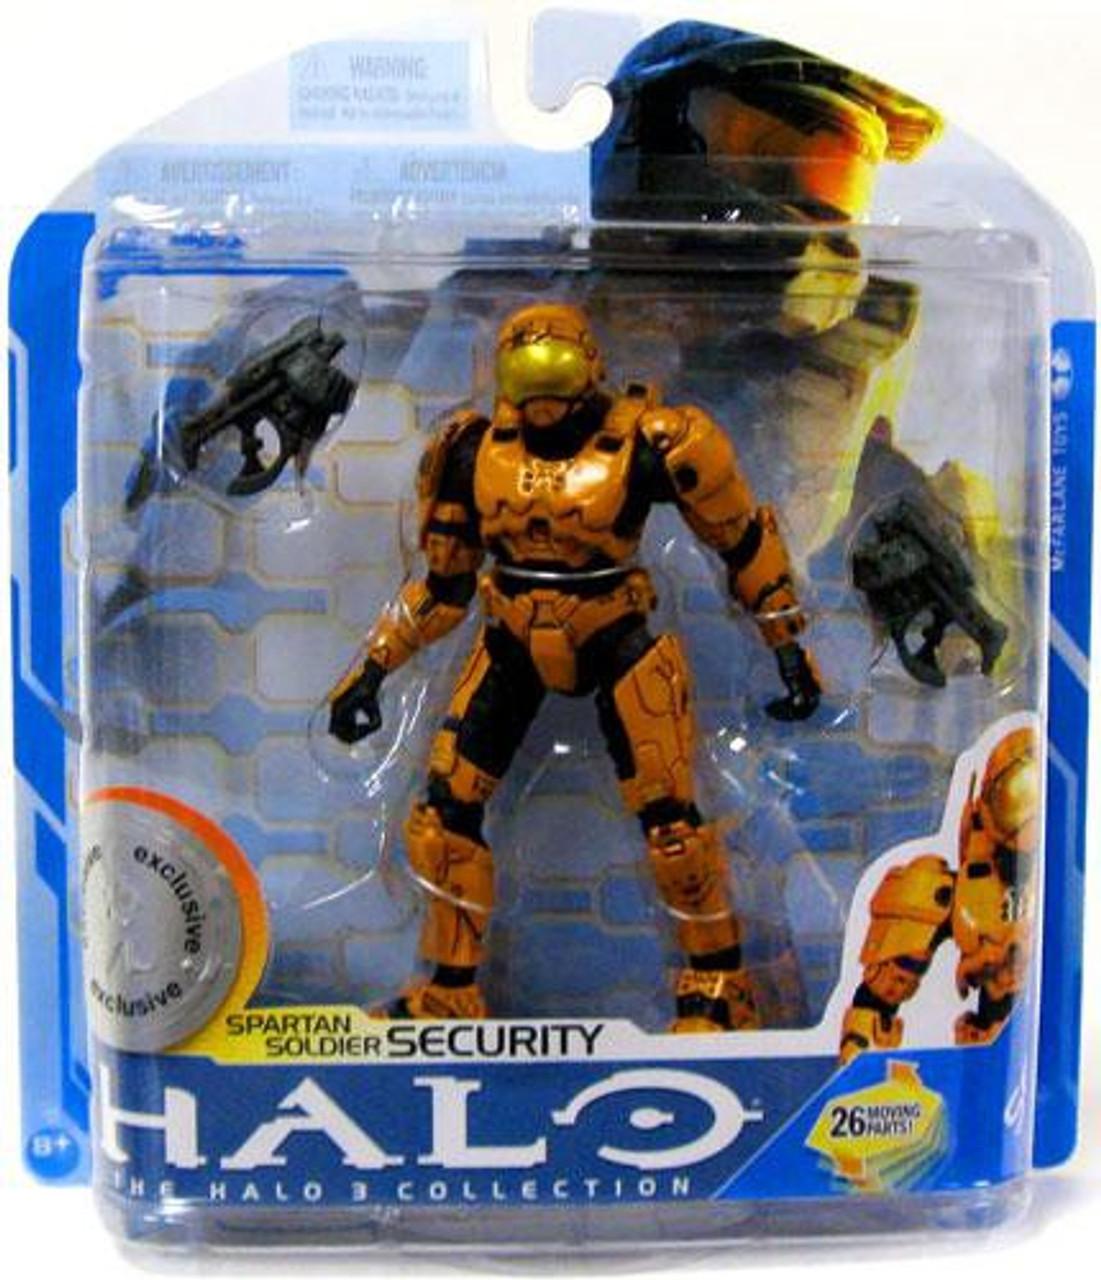 McFarlane Toys Halo 3 Series 7 Spartan Soldier Security Exclusive Action Figure [Orange]